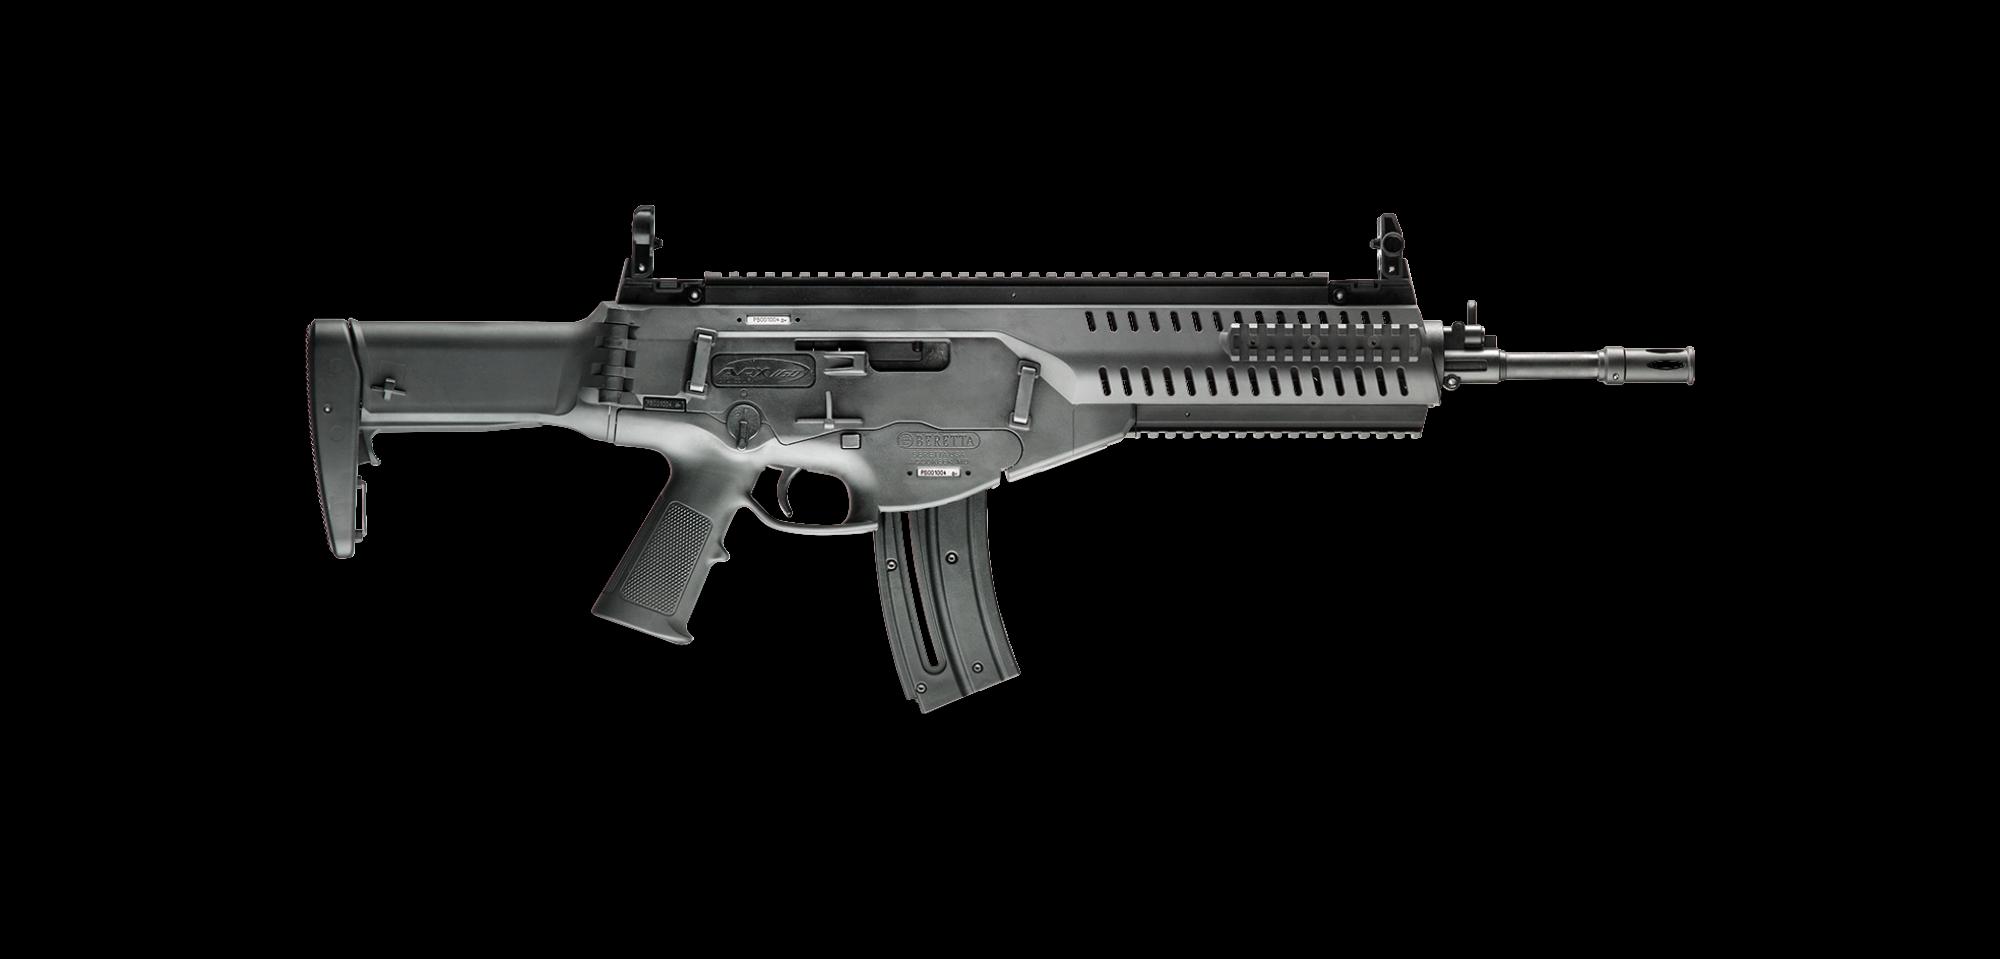 vector transparent library Arx a assault rifle. Vector carbine 22lr